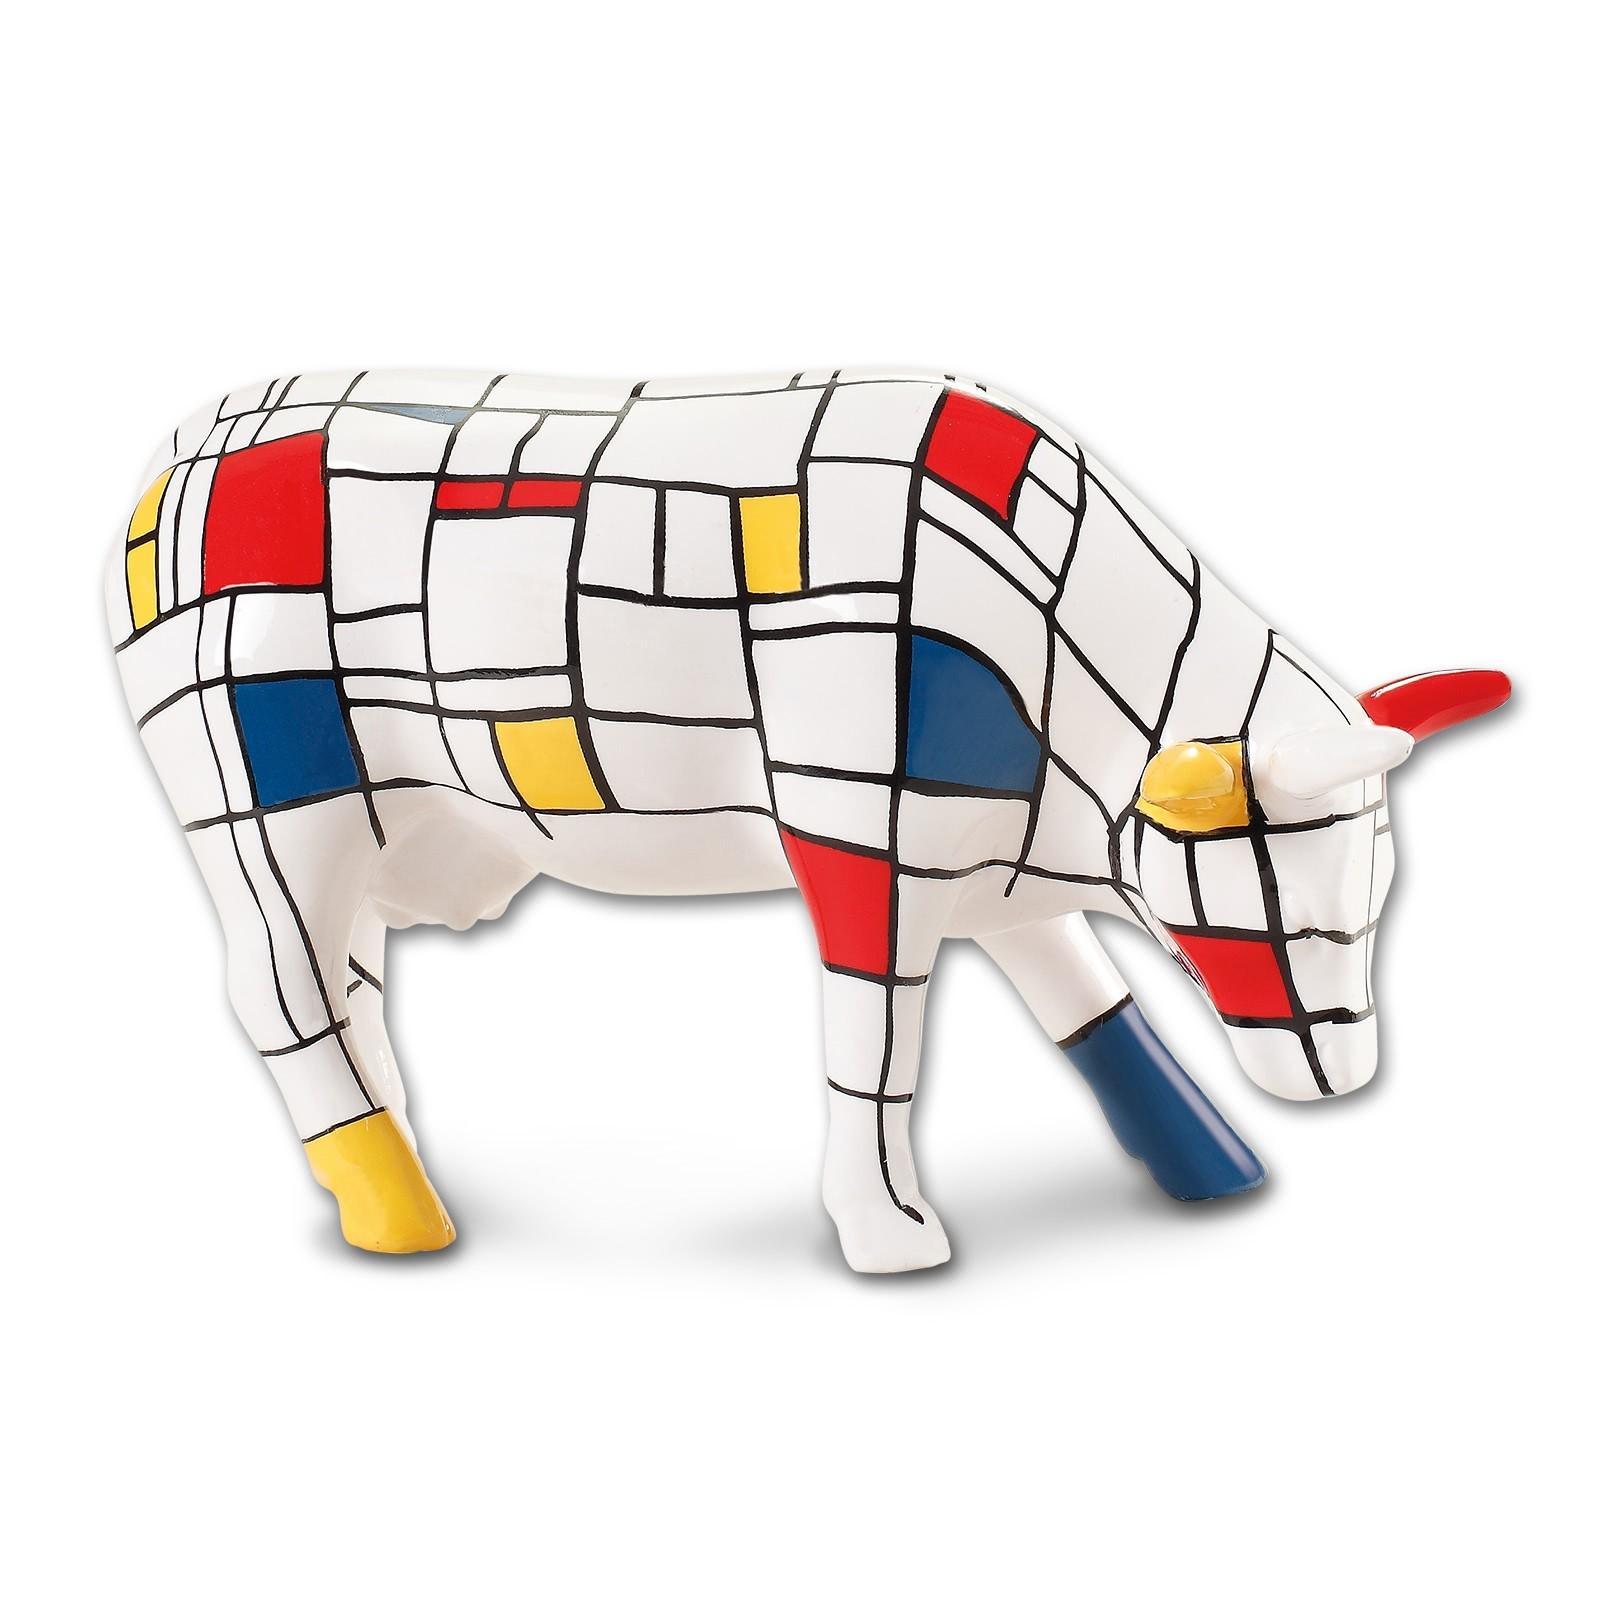 Design Kuh mit geometrischem Farbmuster 4,5cm Köthen Kuhparade KOS004